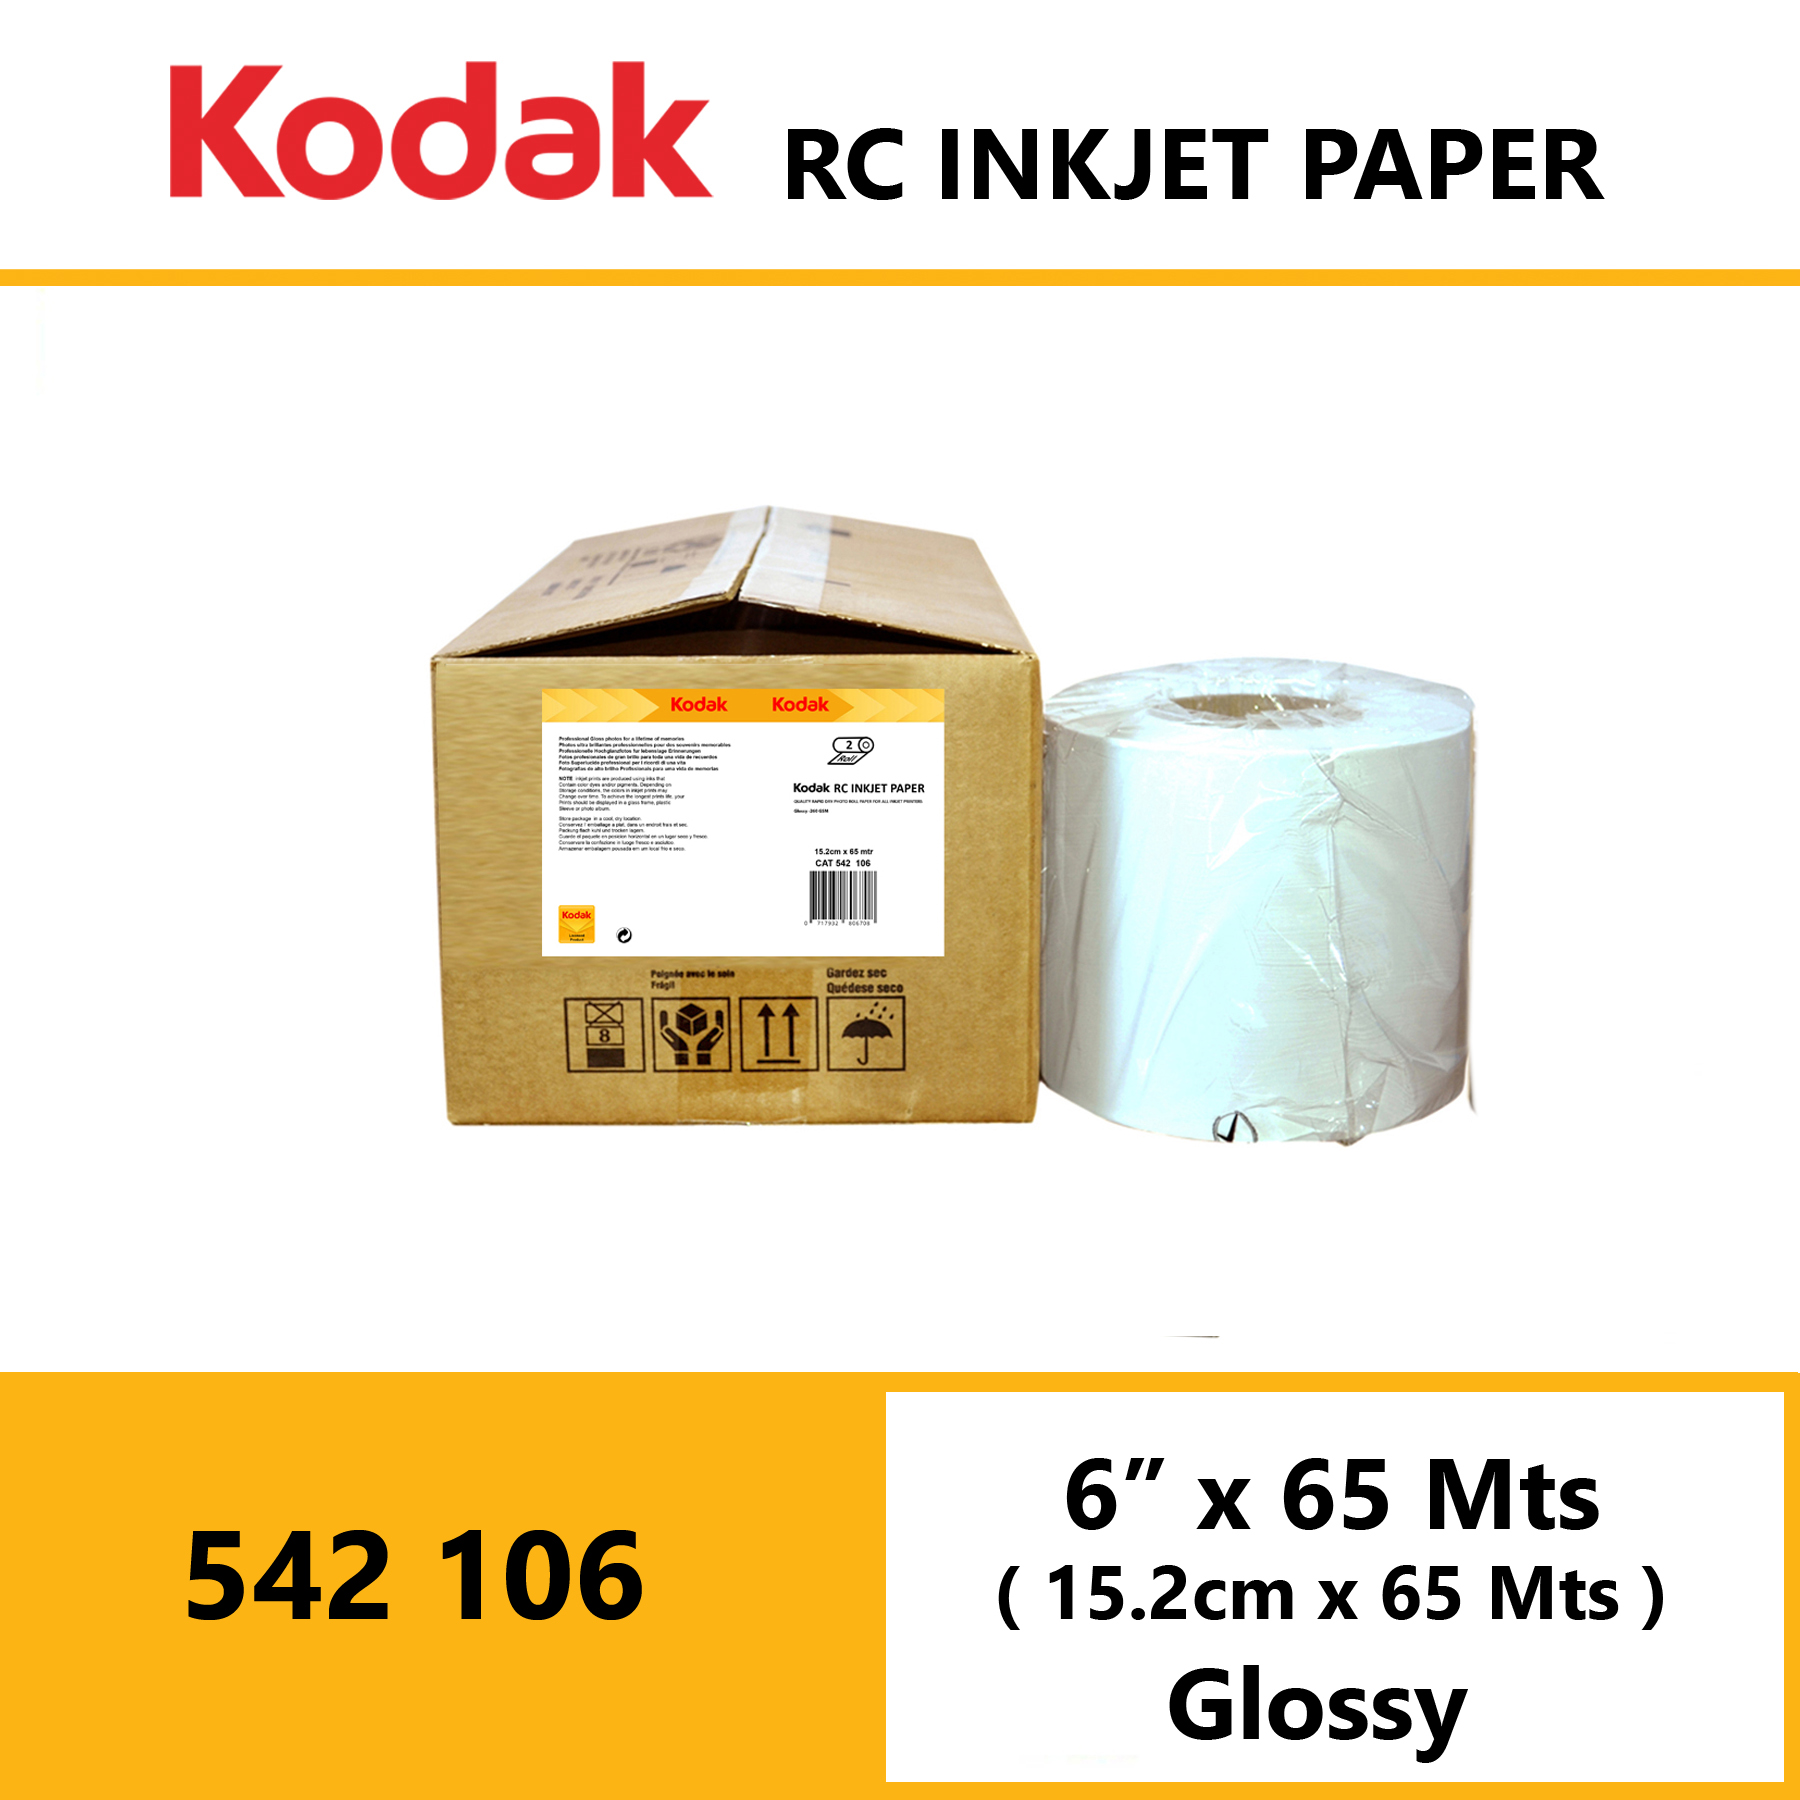 "Kodak Inkjet RC Paper 6 "" x 65 Mtrs Glossy"